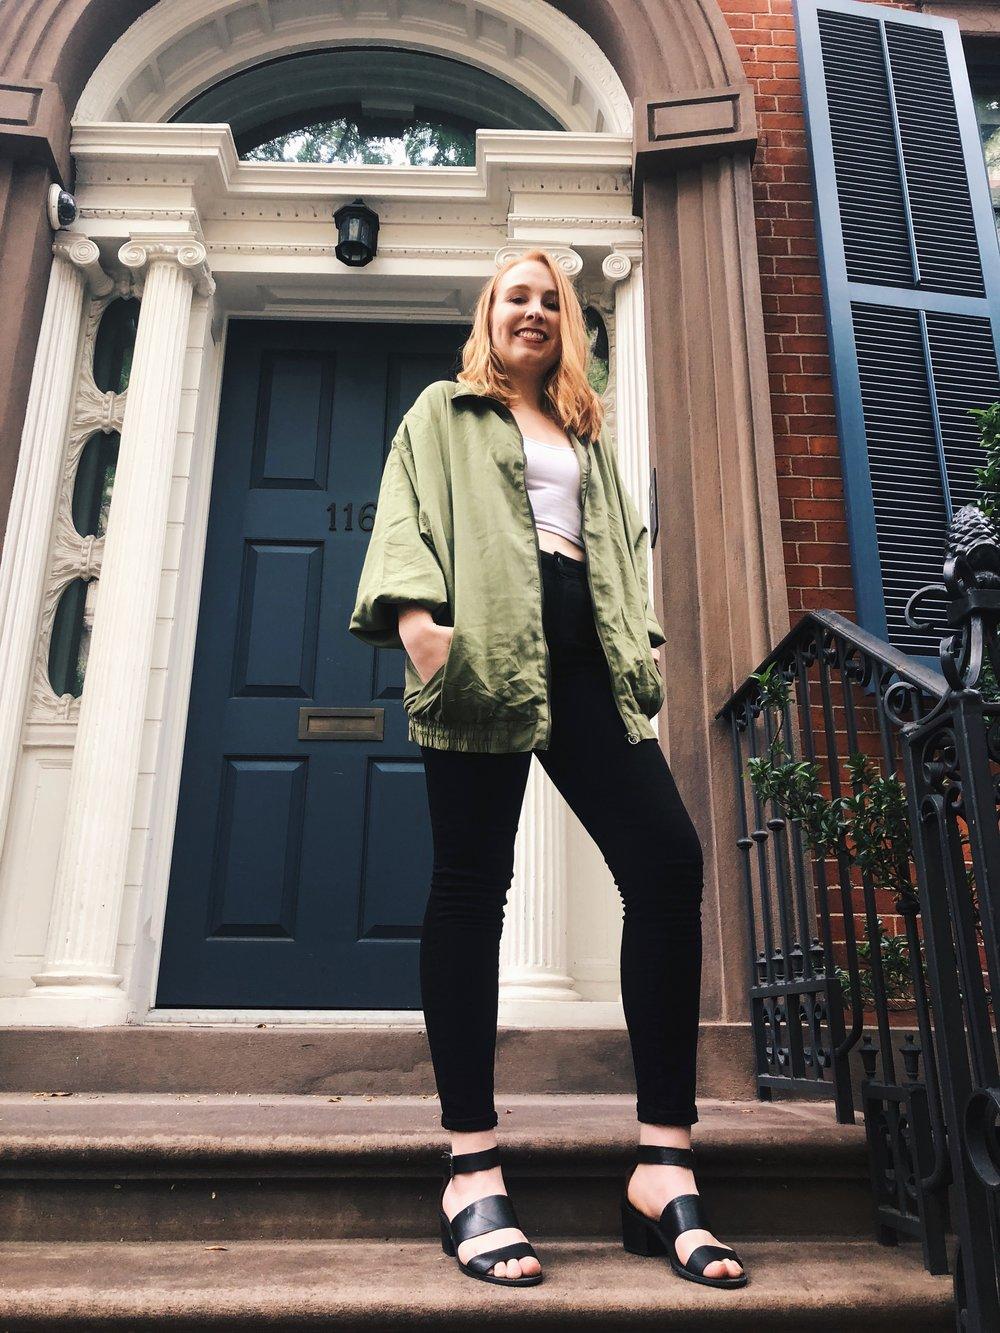 Emilie in the Vintage Silk Duster Jacket.